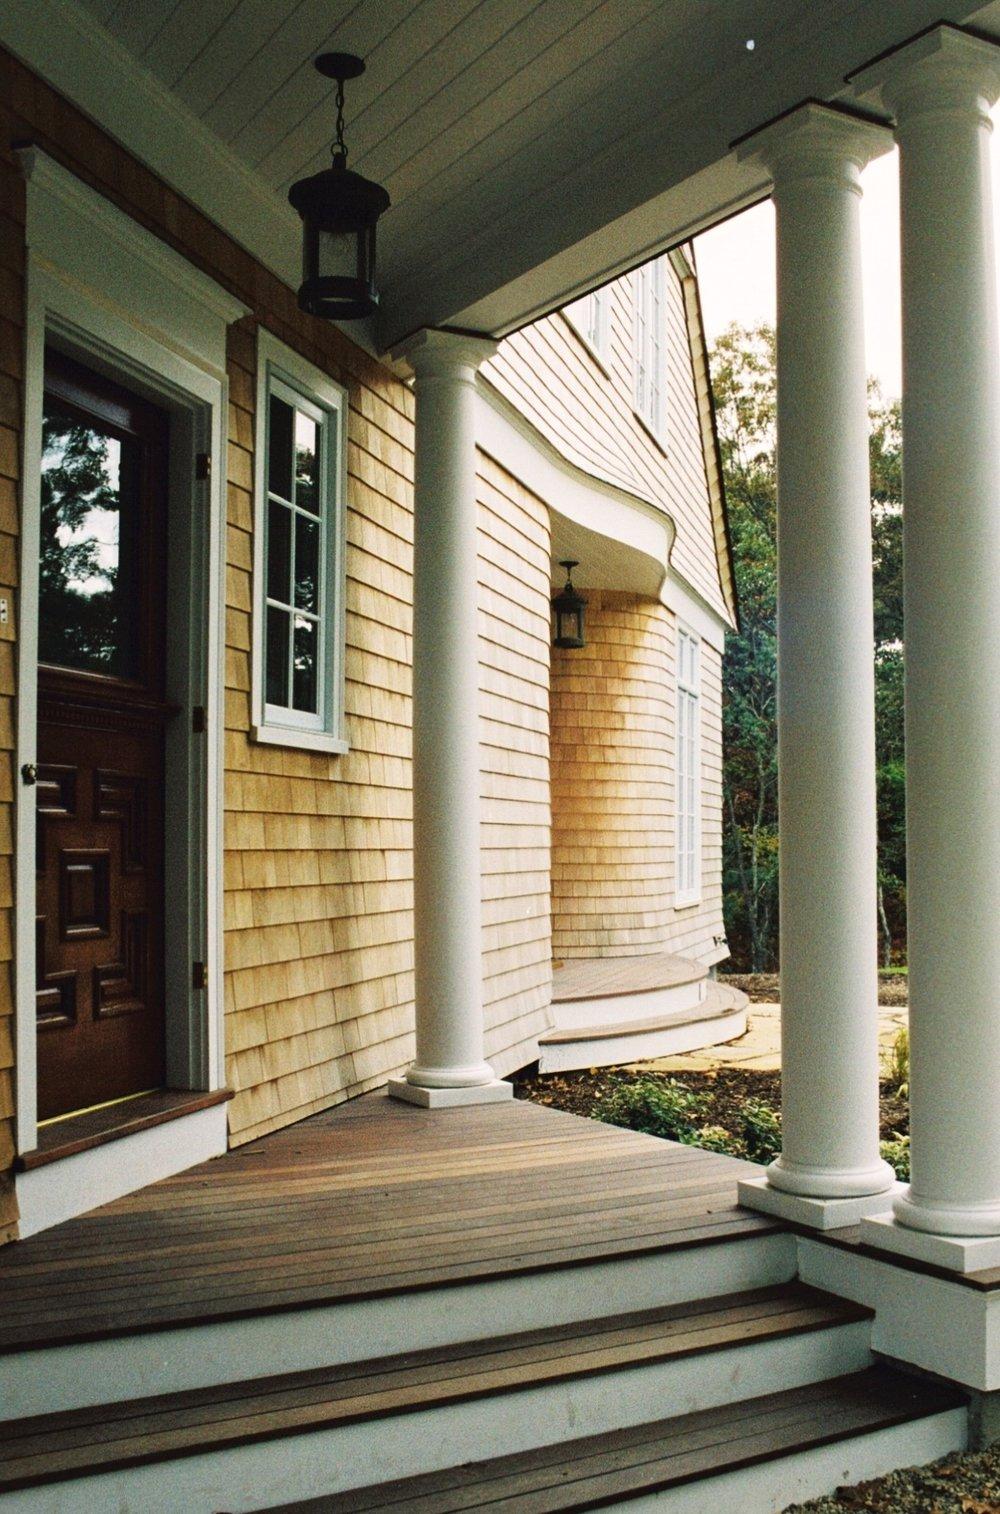 Robertson-Porch.jpg